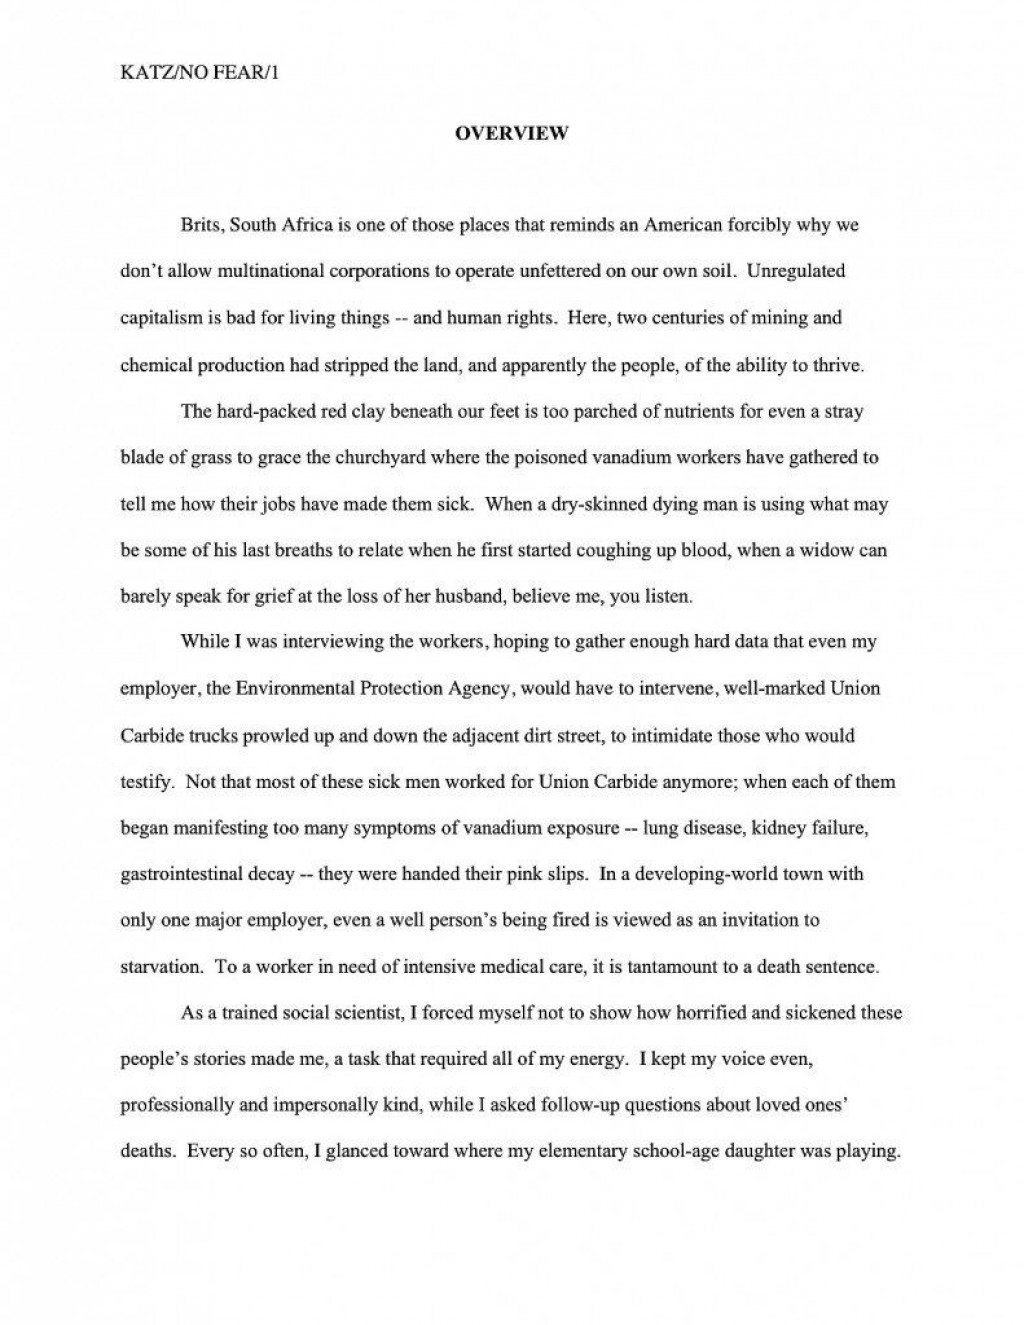 007 Singular Nonfiction Book Proposal Template Photo  ExampleLarge